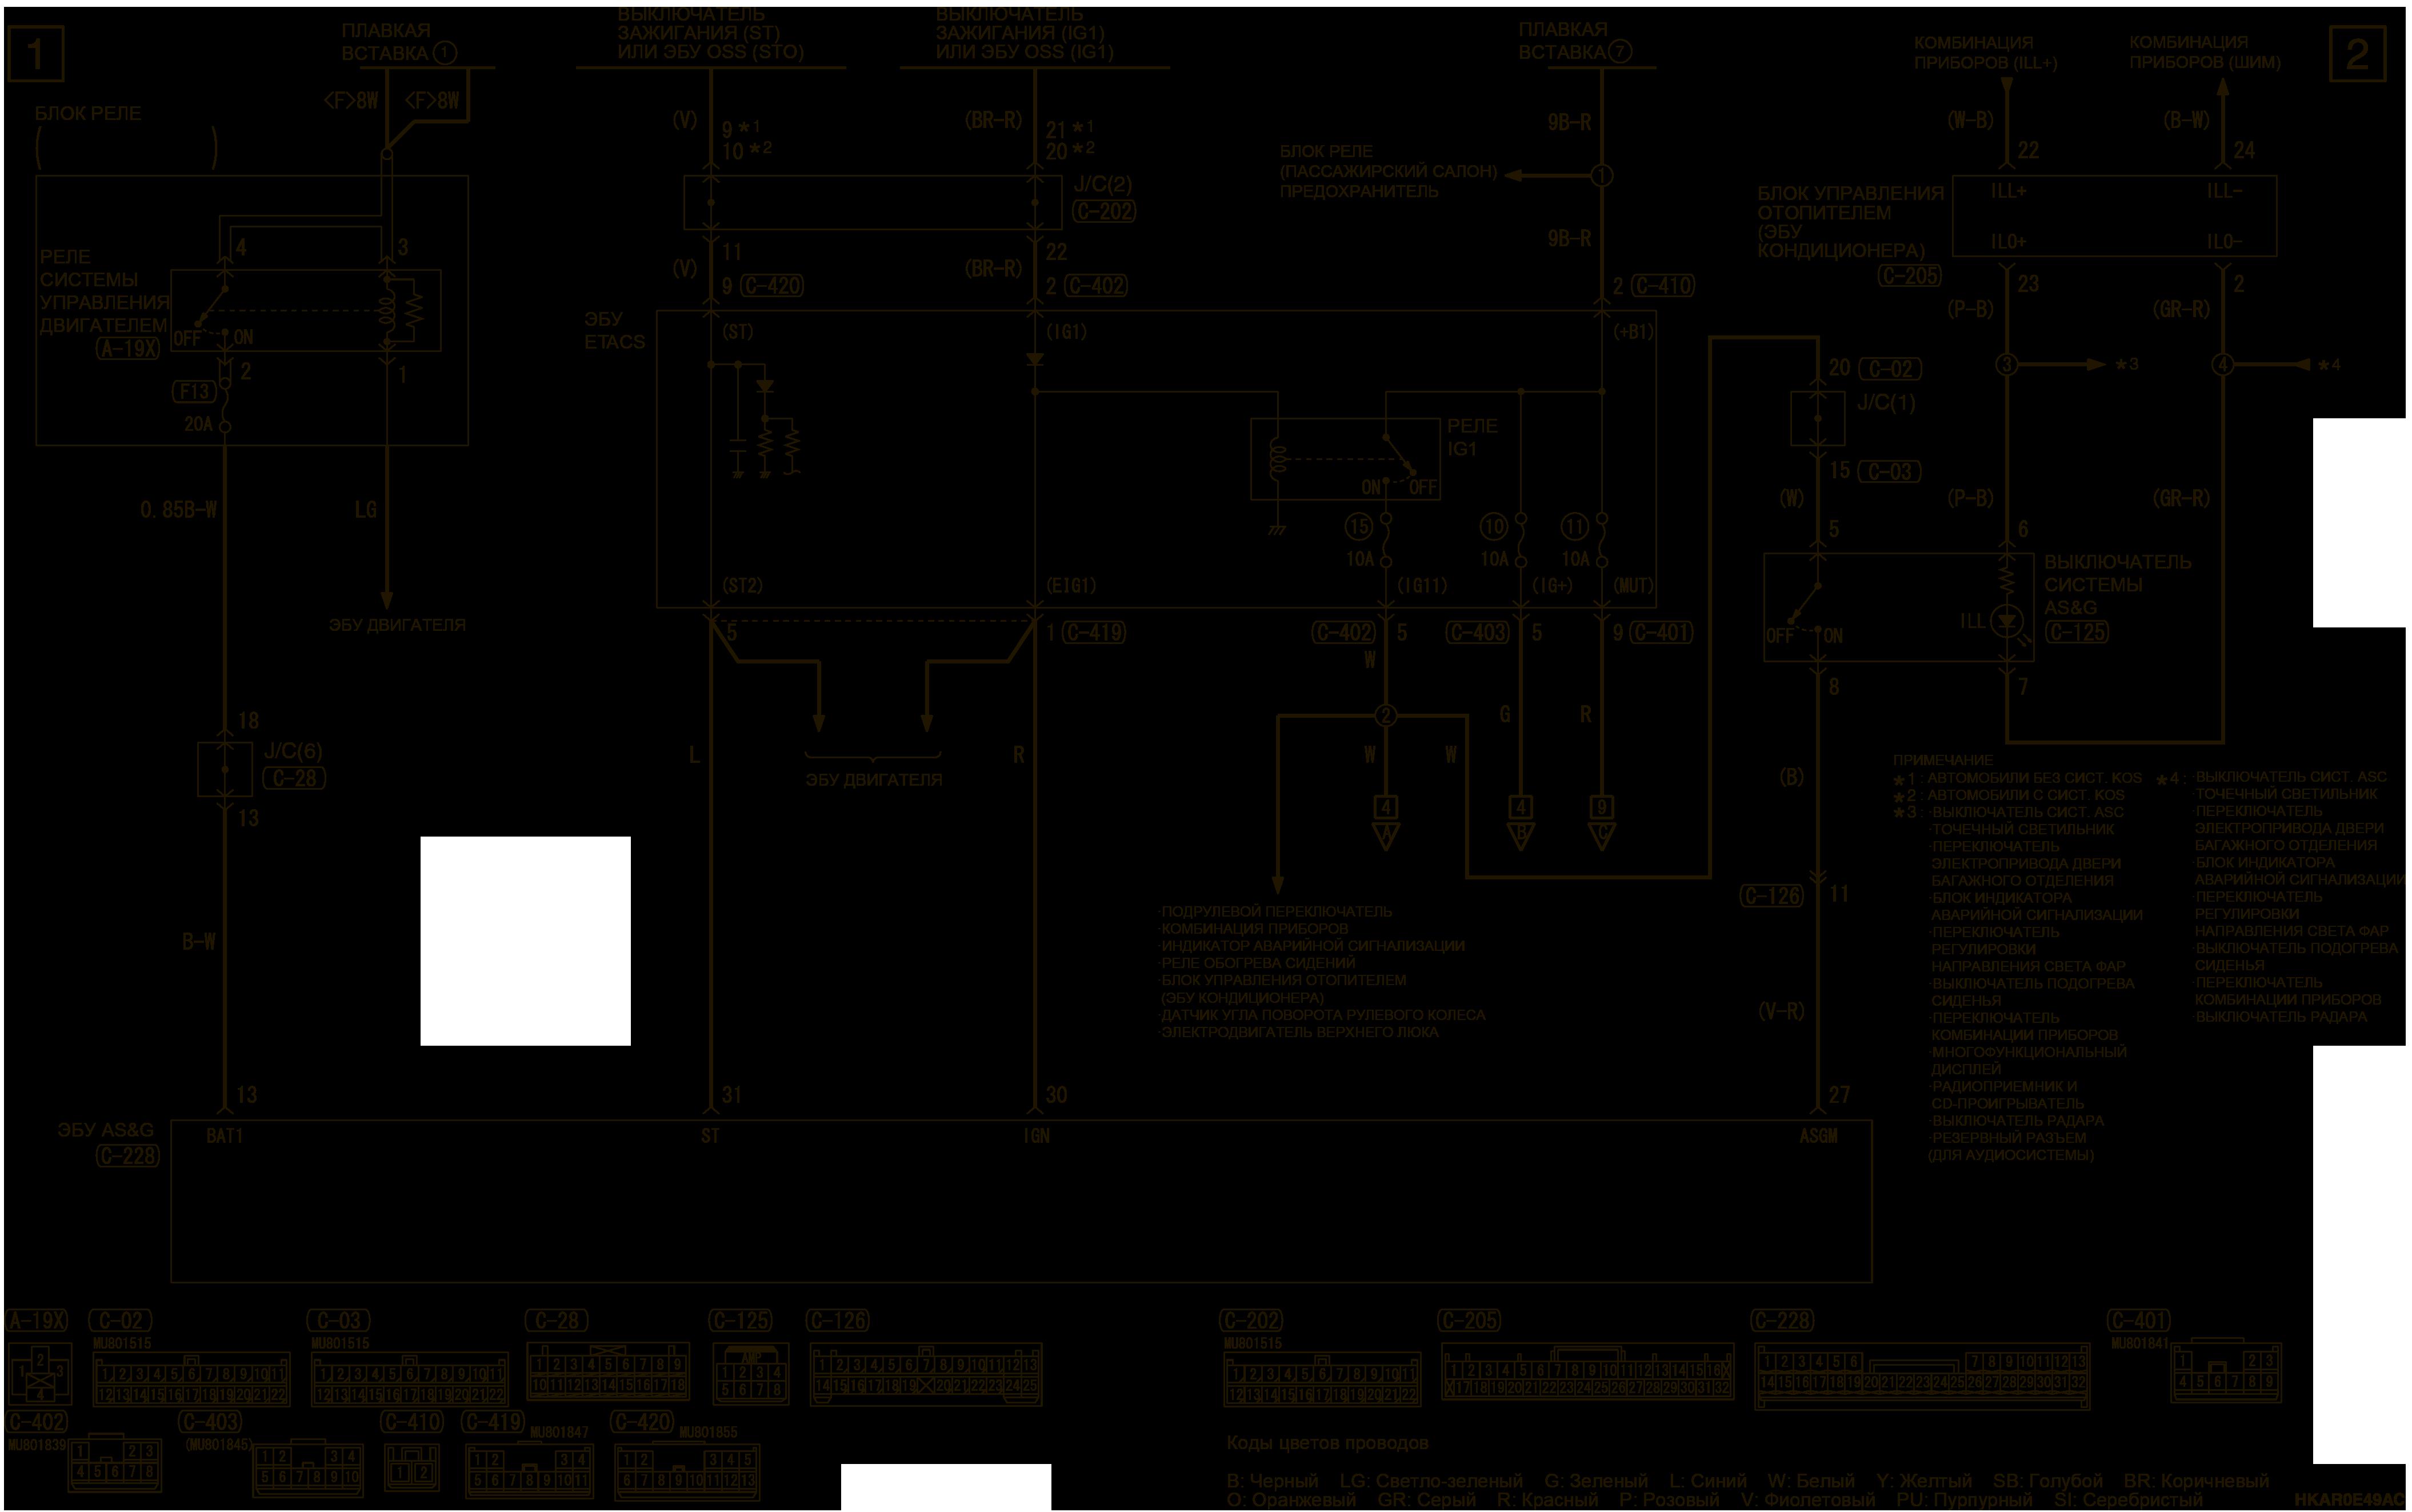 mmc аутлендер 3 2019 электросхемаСИСТЕМА АВТОМАТИЧЕСКОГО ОСТАНОВА И ЗАПУСКА ДВИГАТЕЛЯ (AS&G) 4J1-M/T